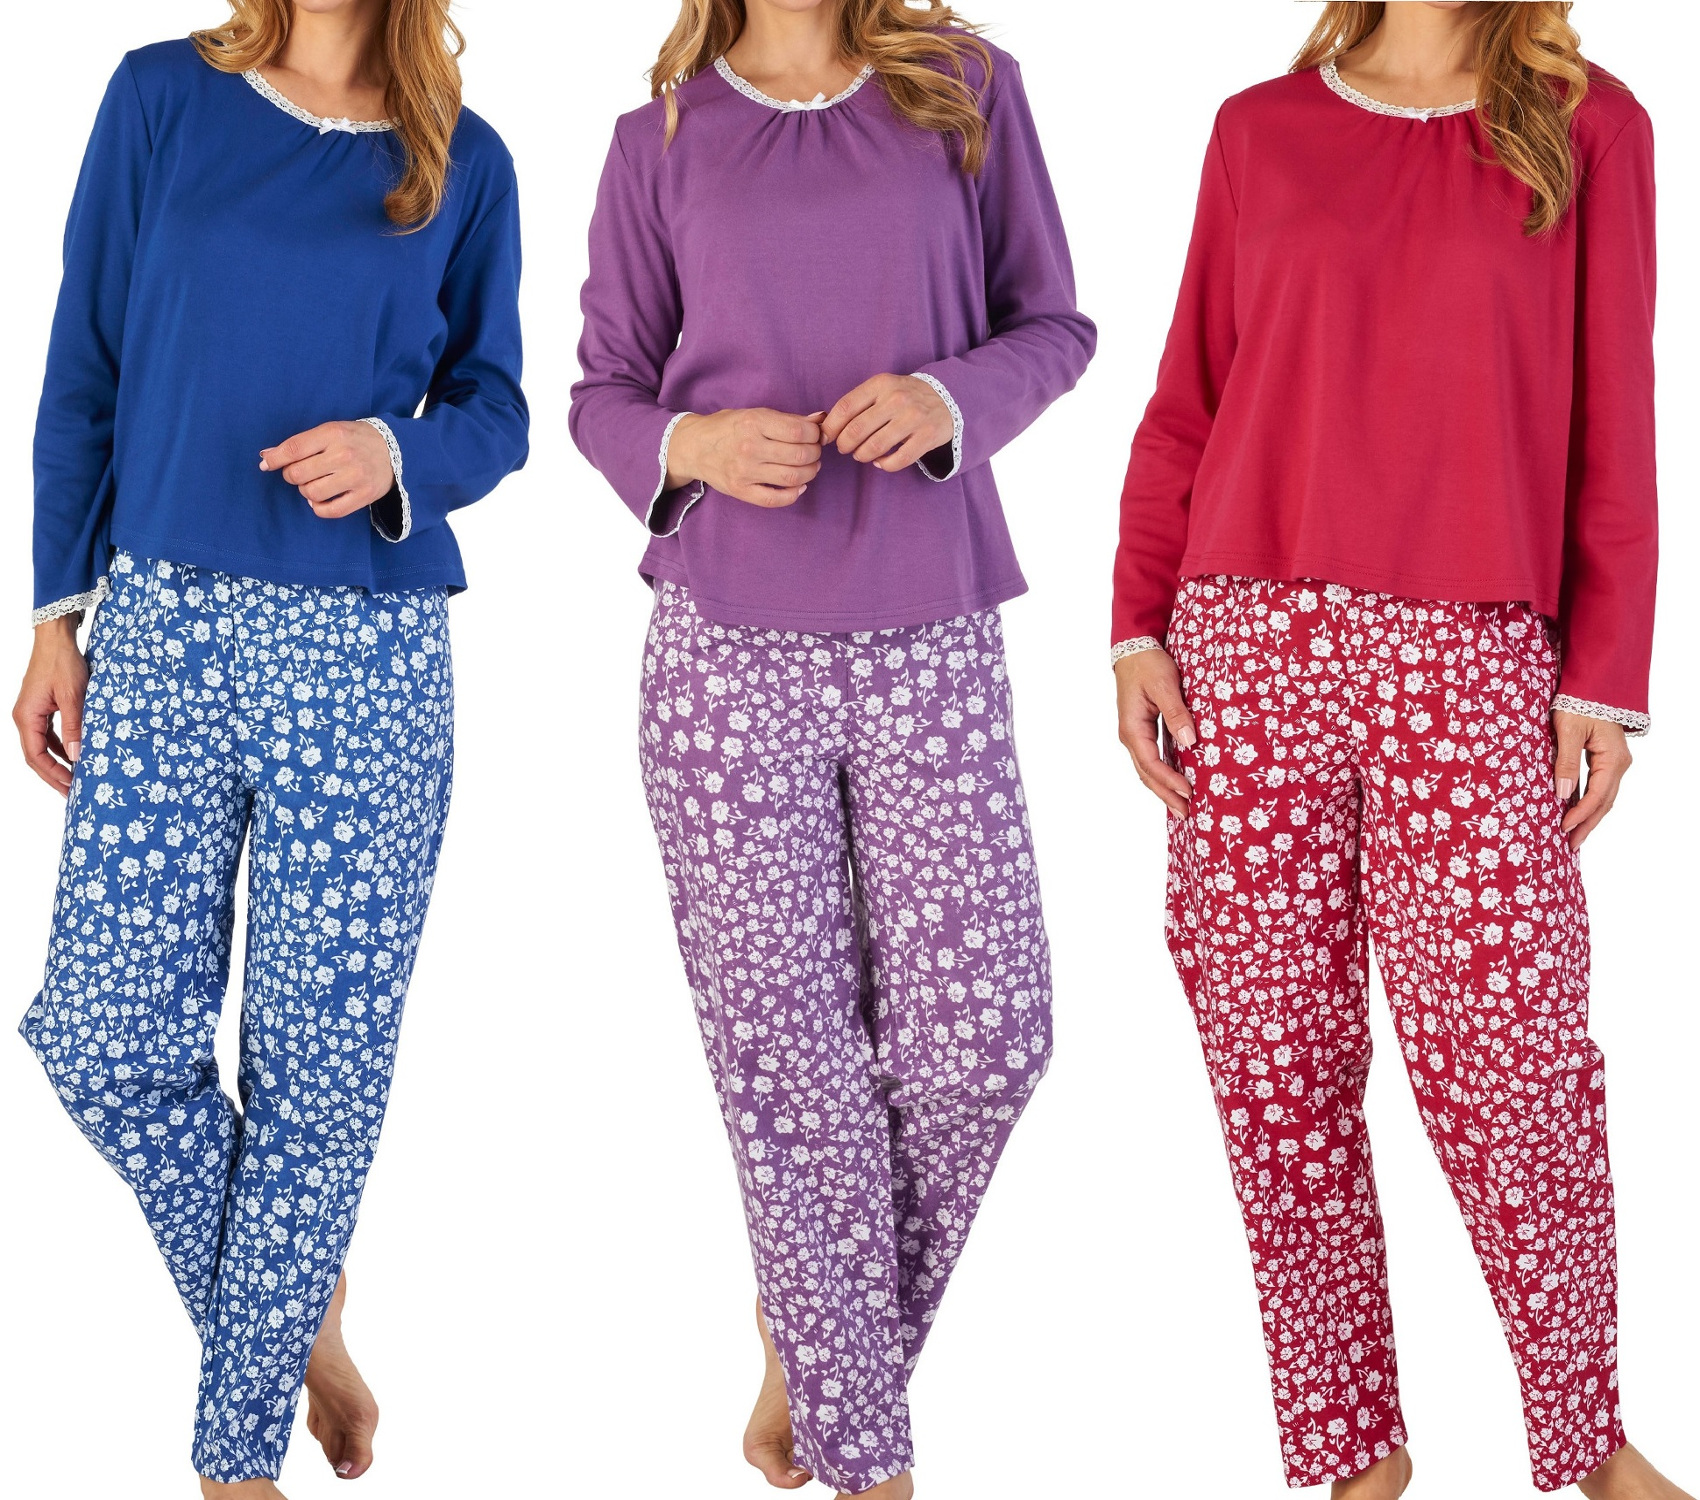 Raspberry Slenderella Floral Print Pyjama Set Cotton Top and Flannel Bottoms